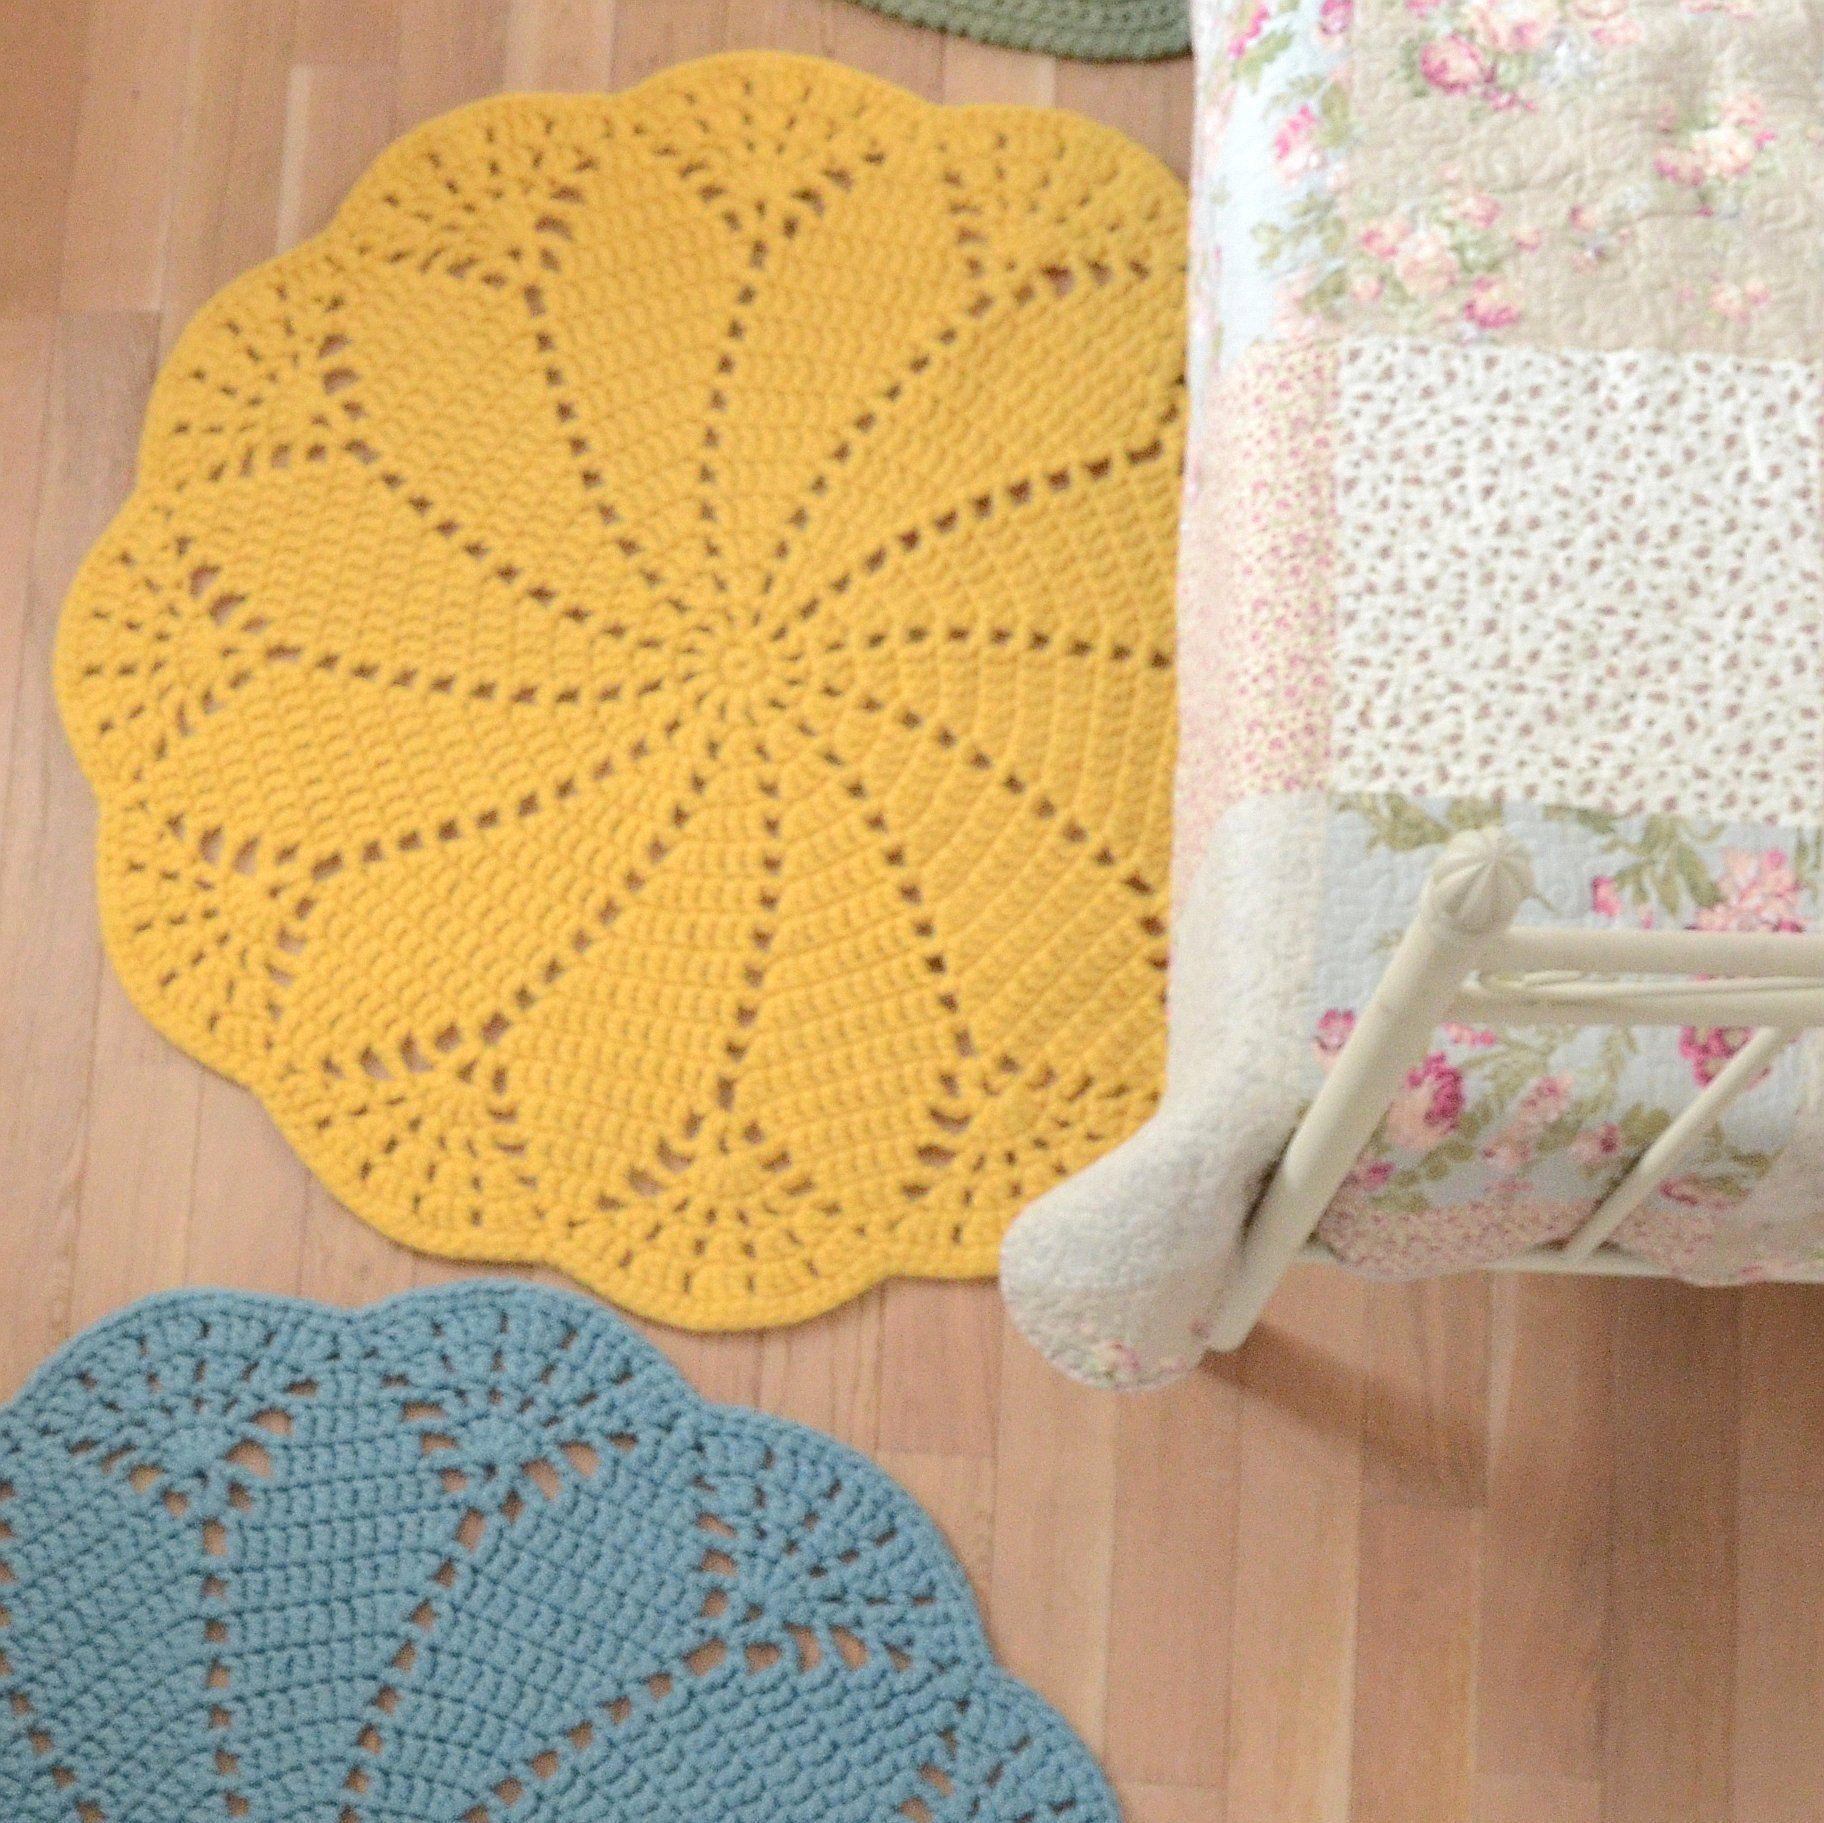 Yellow Round Crochet Doily Rug Wool Felt Oversized Boho Doily Rug Retro Style Giant Doily Rug Boy Nursery Rug Crochet Doily Rug Doily Rug Wool Felt